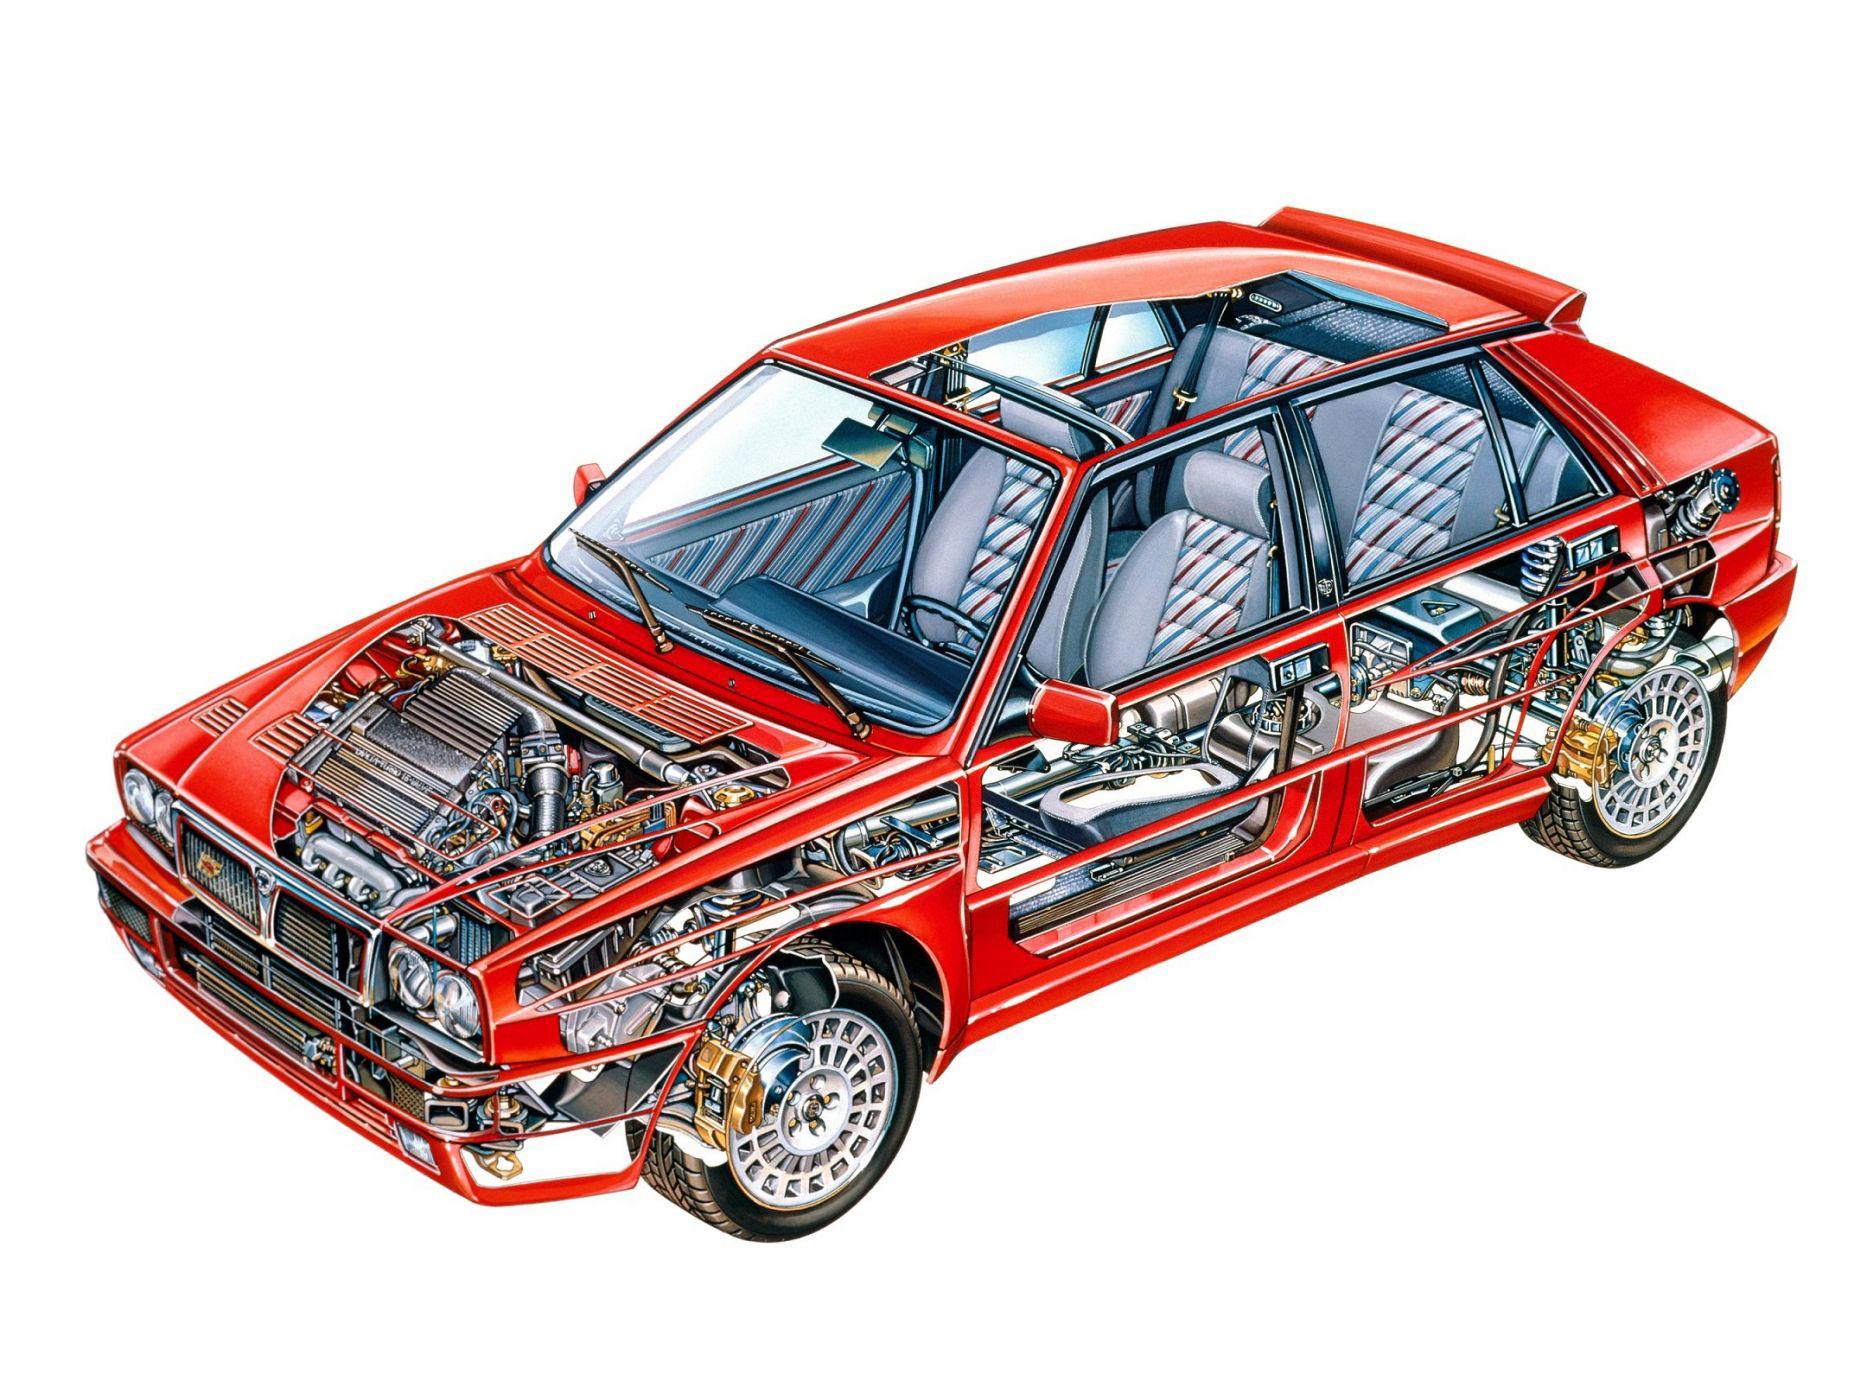 Lancia Delta HF Integrale Evo cutaway drawing